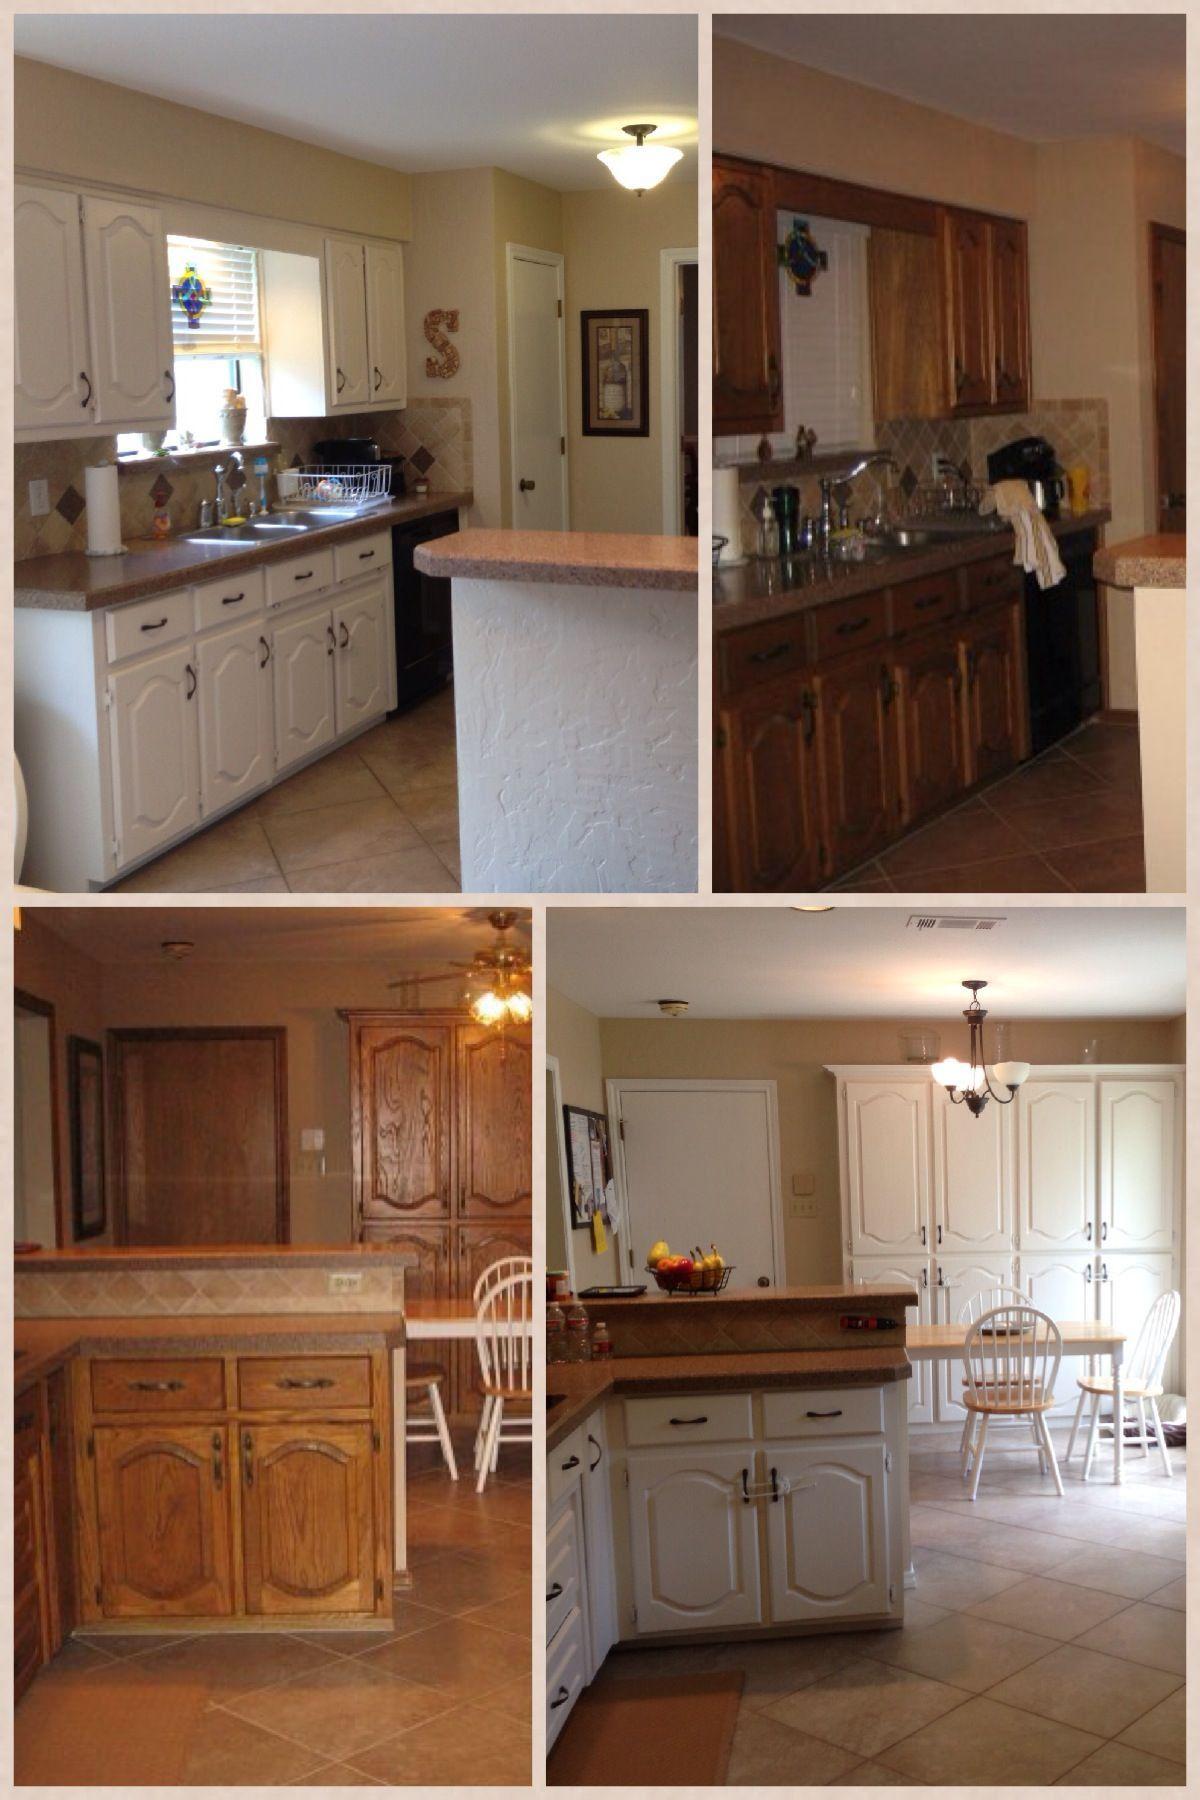 Home Depot Kitchen Cabinet Doors 2020 In 2020 Home Depot Kitchen Refacing Kitchen Cabinets Refinishing Cabinets